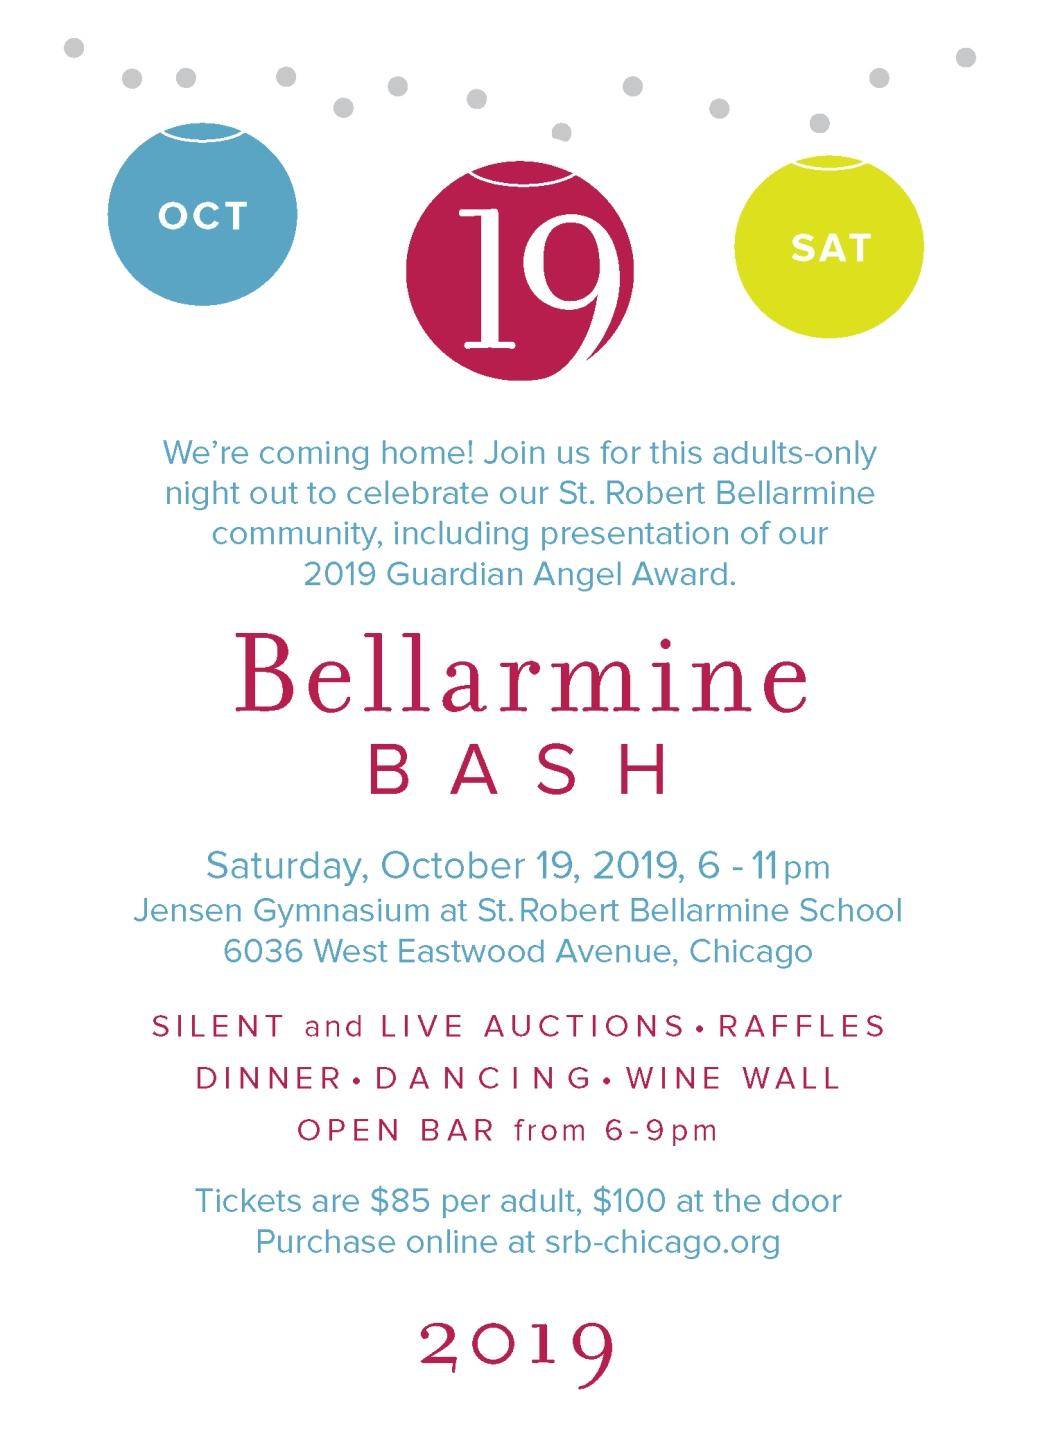 BellarmineBash_Invite Final.jpg